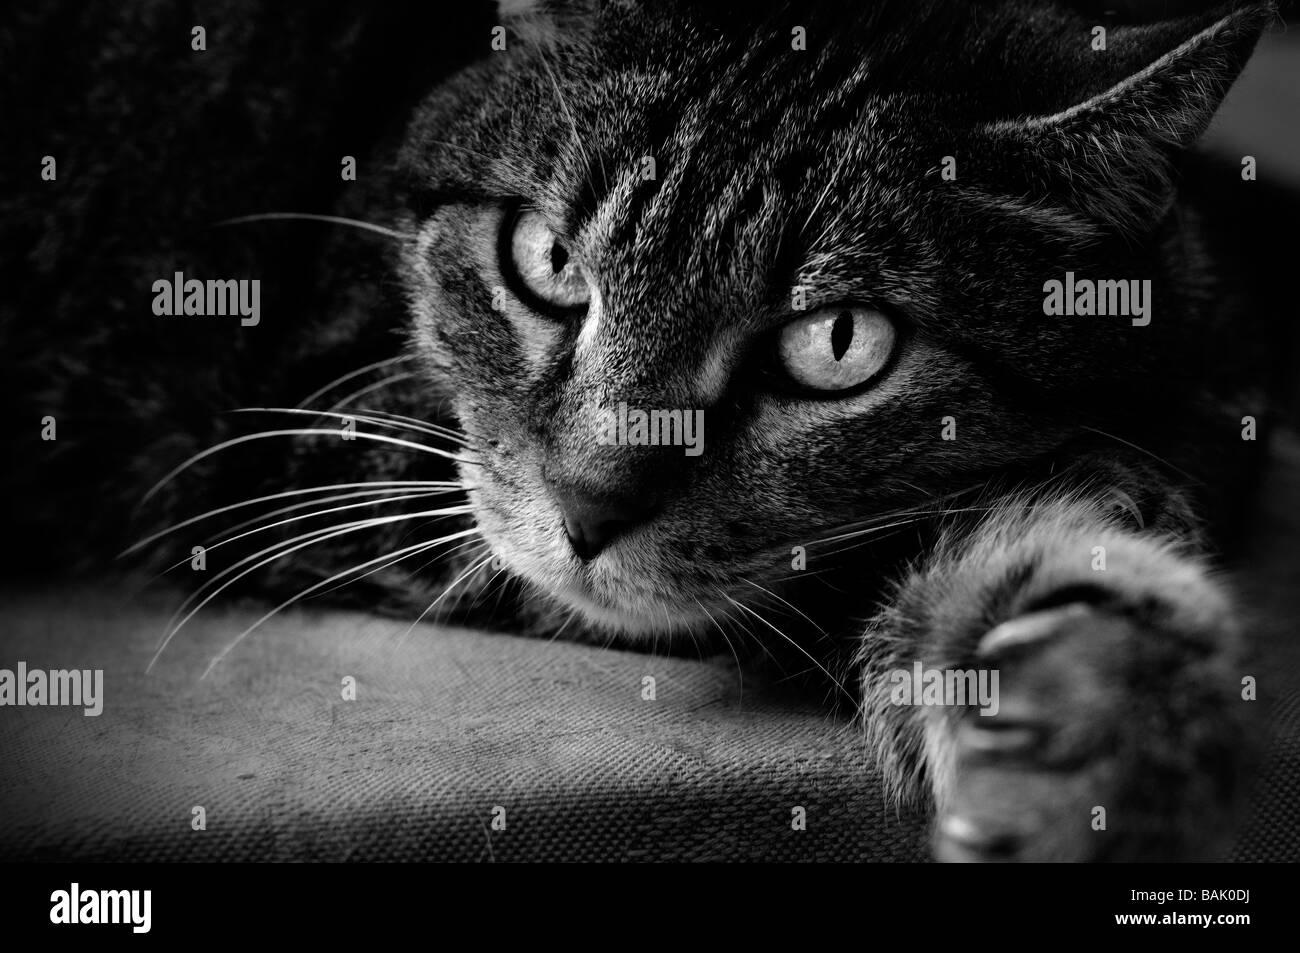 Liegende Katze Stockbild